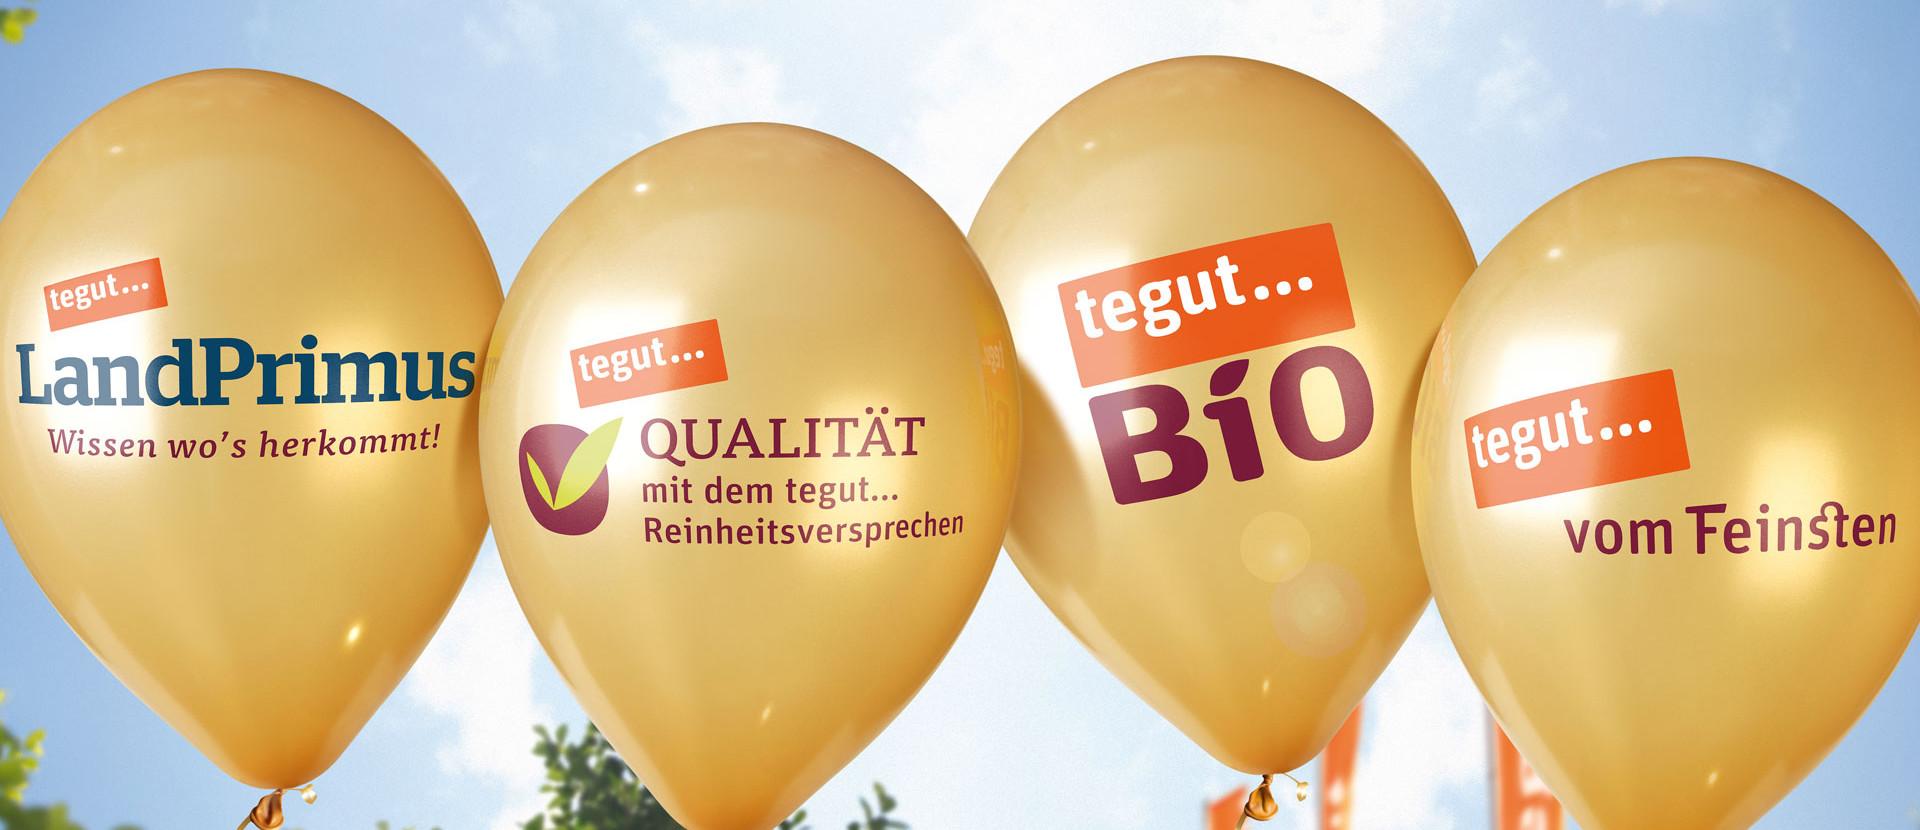 vier goldene Ballons mit tegut... Eigenmarken-Aufschrift